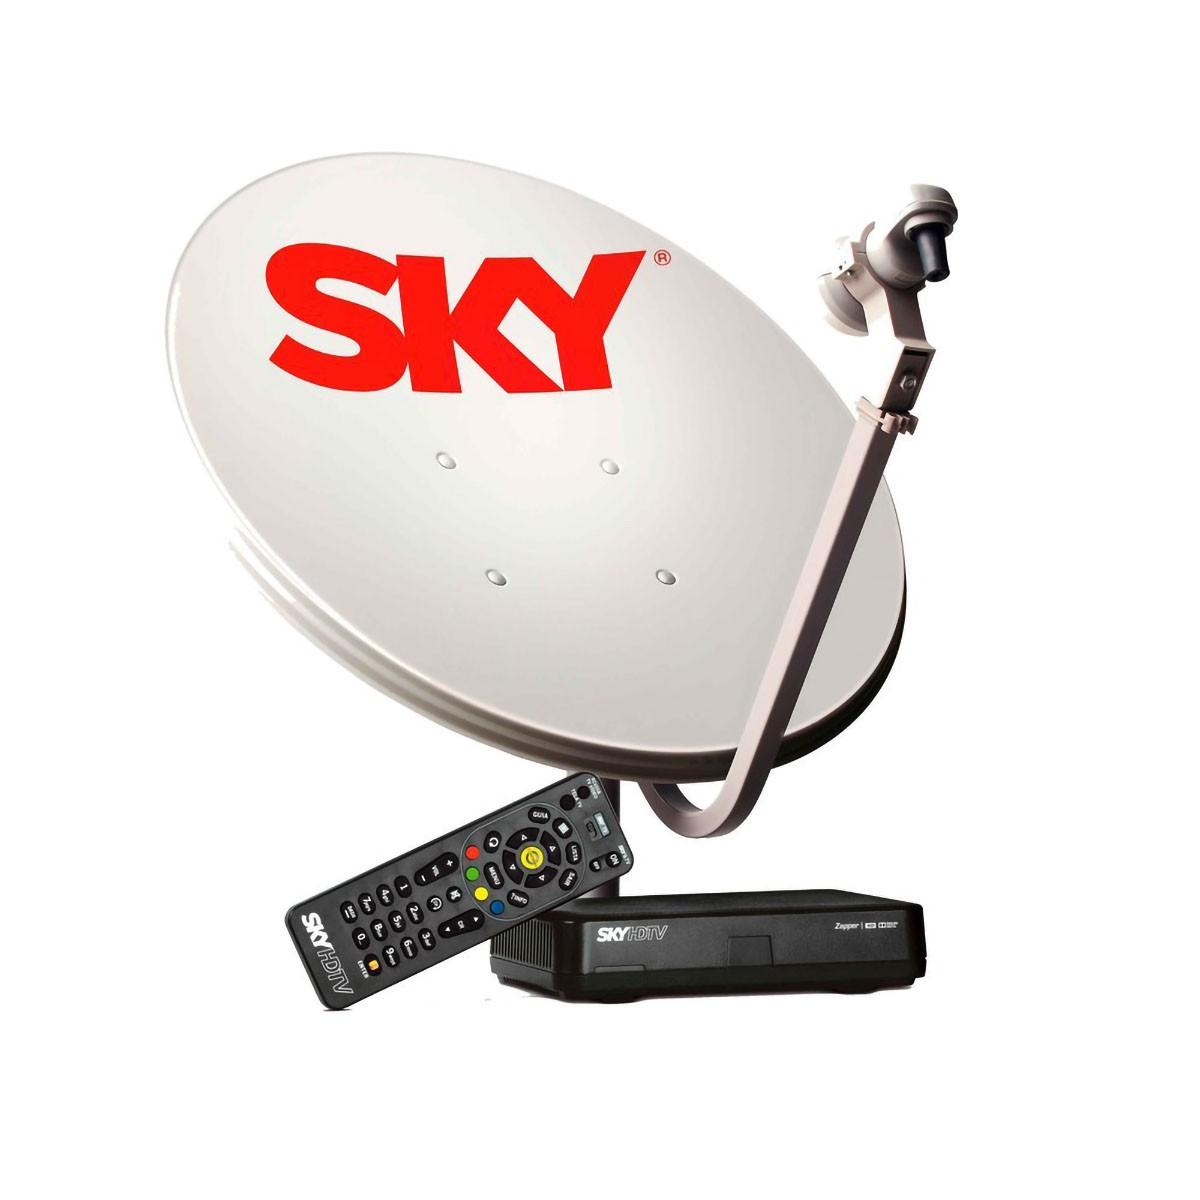 Kit Sky Pré Pago Flex HD Antena 60 cm